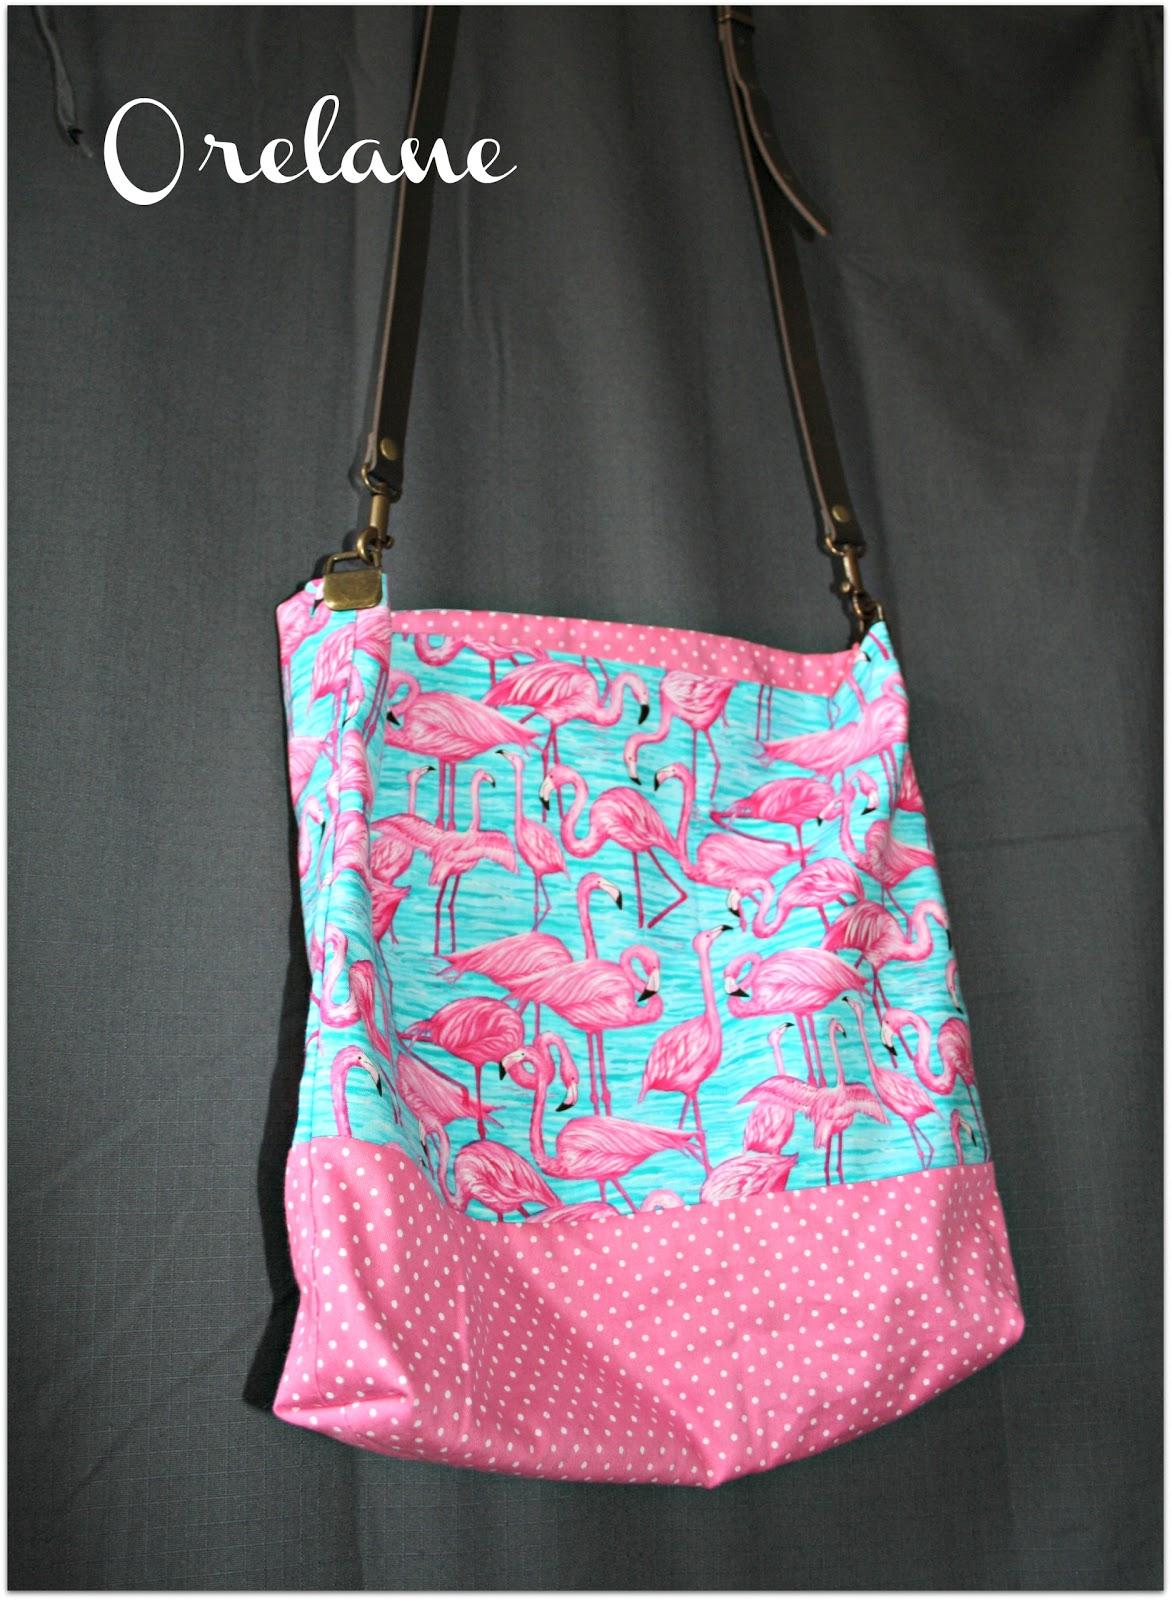 Fabuleux Orelane: Mon tuto de sac facile pour débutante ou nulle en couture  IS09